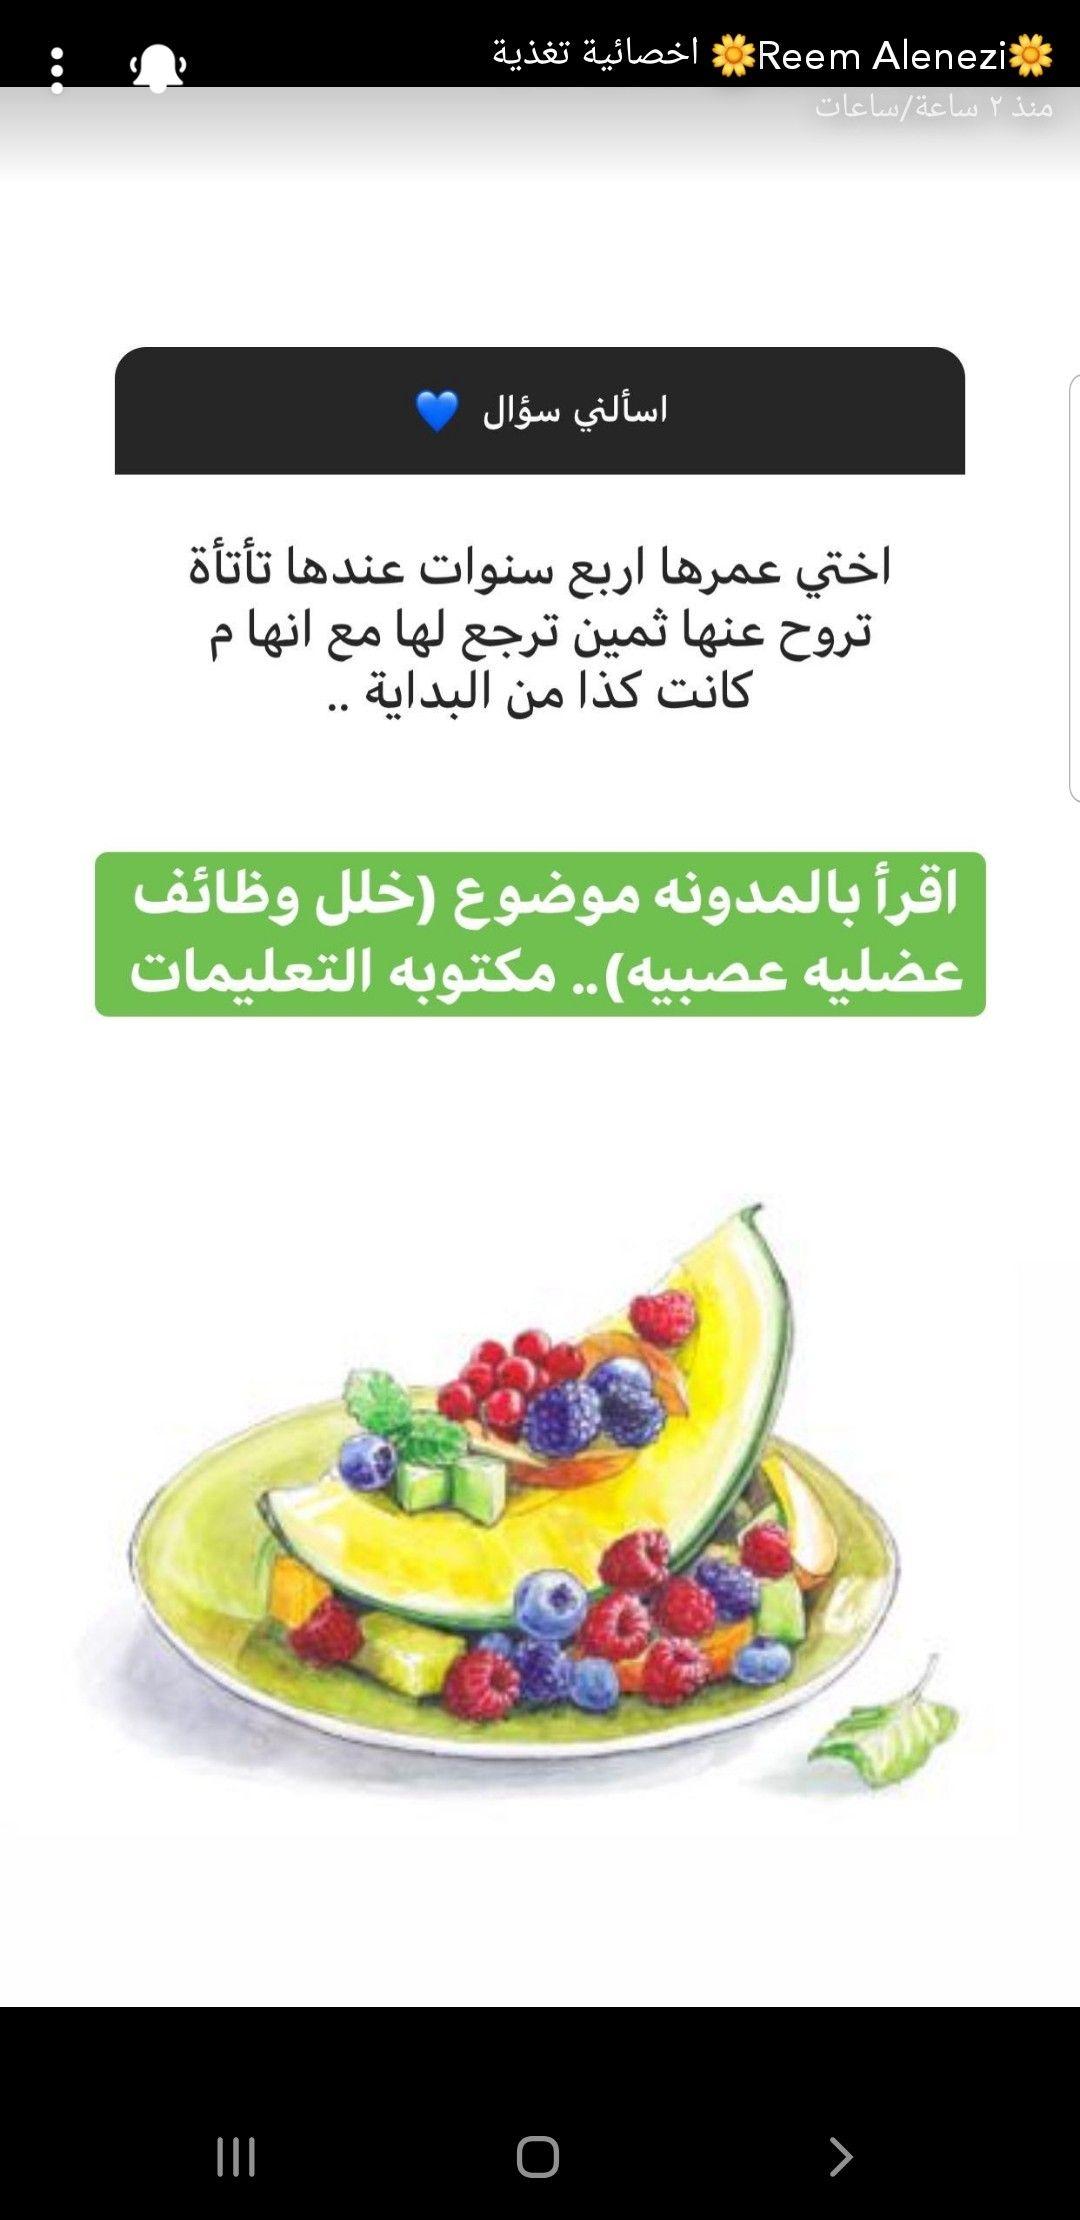 Pin By Aman On تغذية علاجية المعدة بيت الداء و الدواء توعية Health Pandora Pandora Screenshot